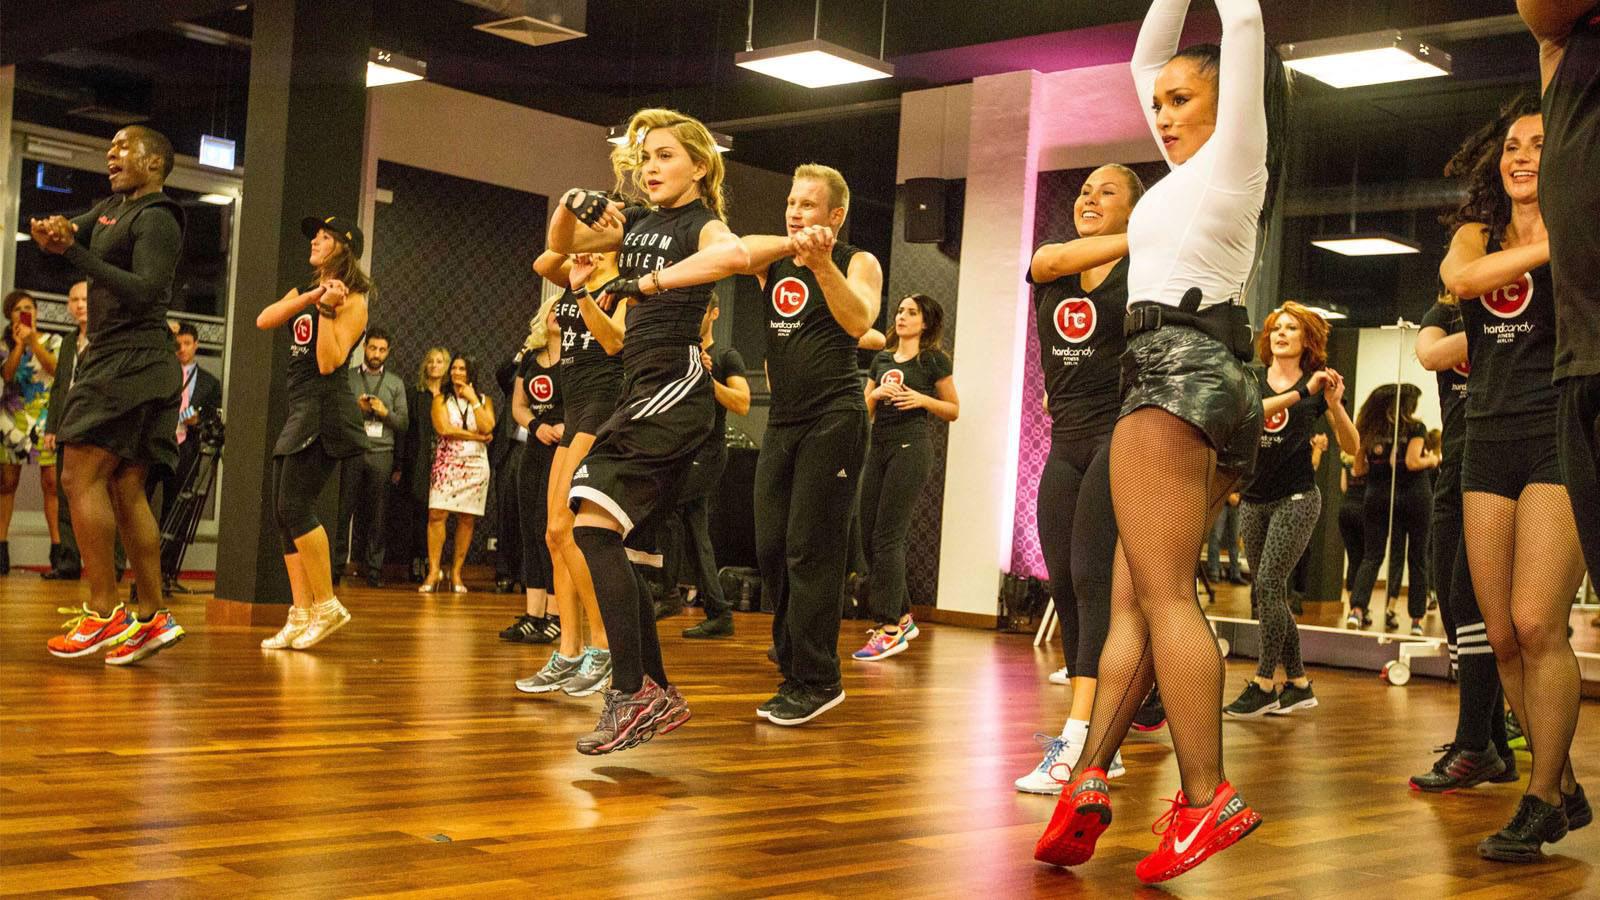 Entrena al ritmo del playlist de Rebel Heart Tour de Madonna